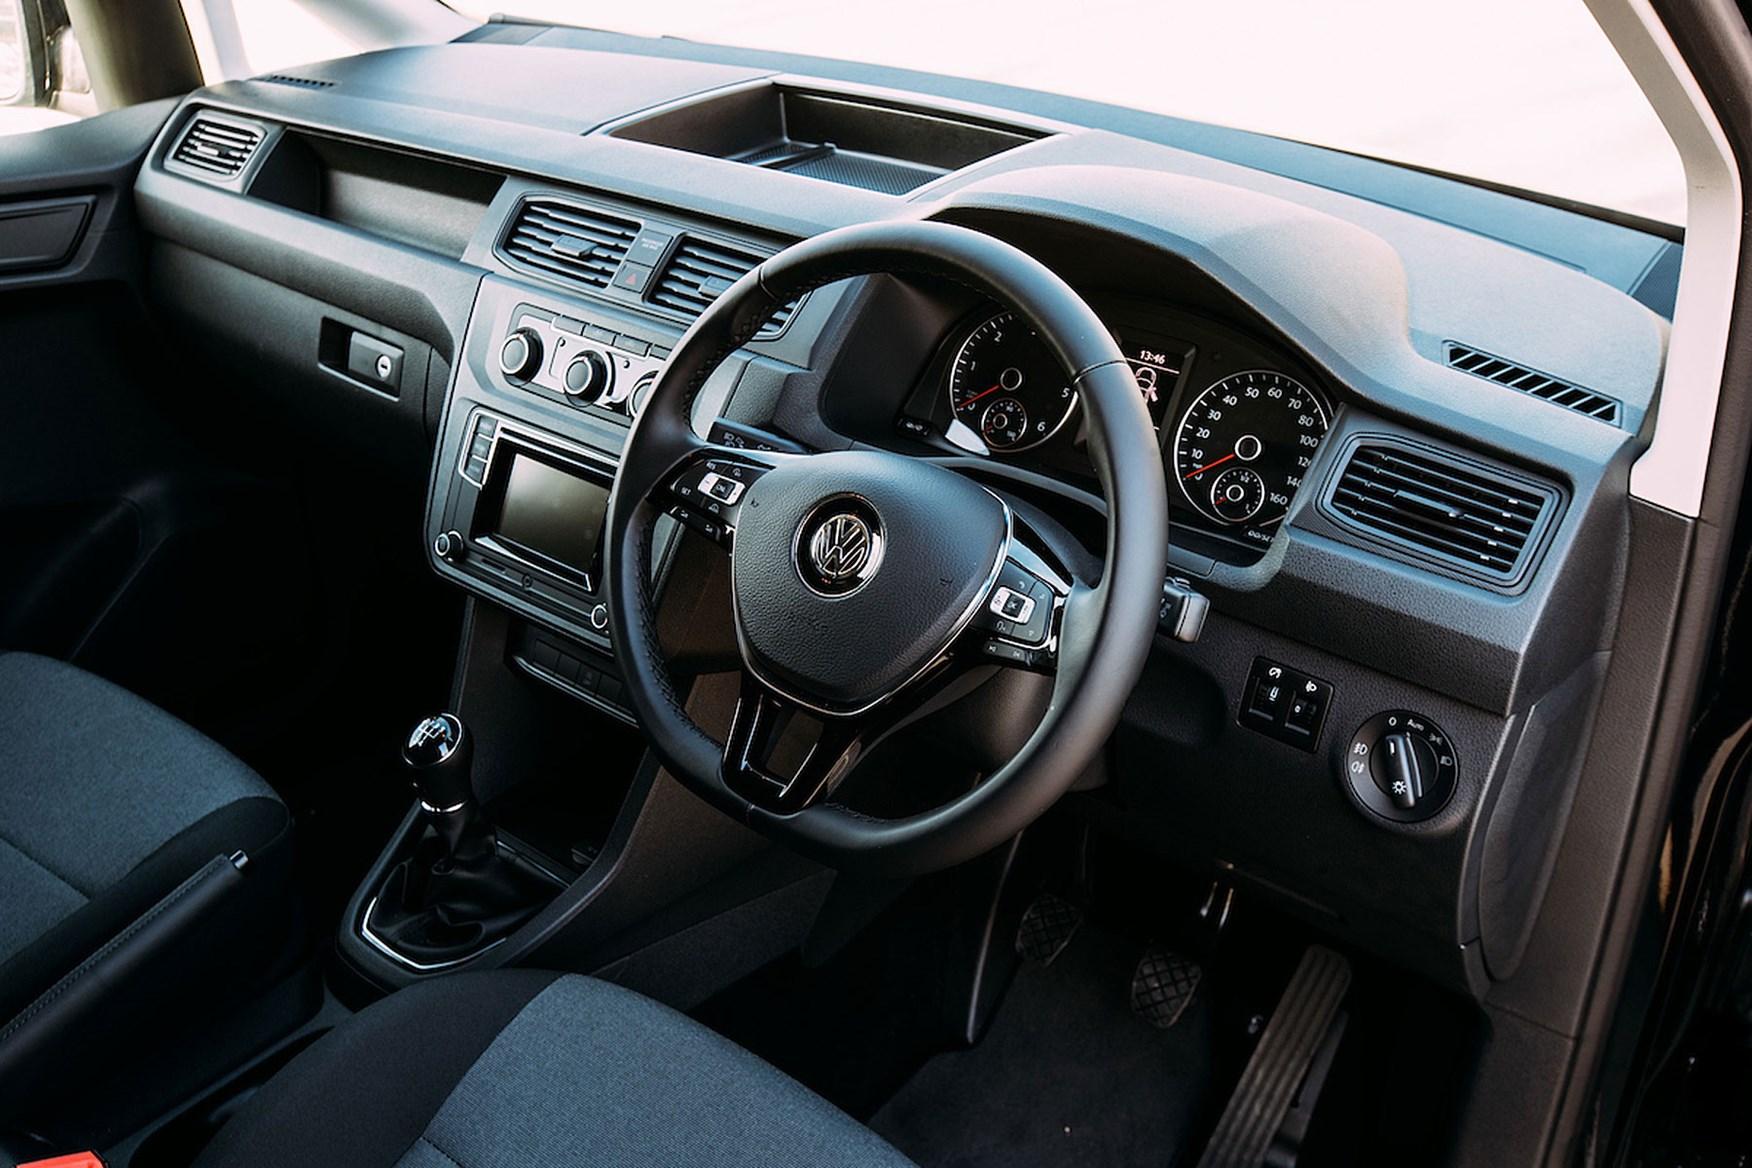 VW Caddy Black Edition review - cab interior, 2017